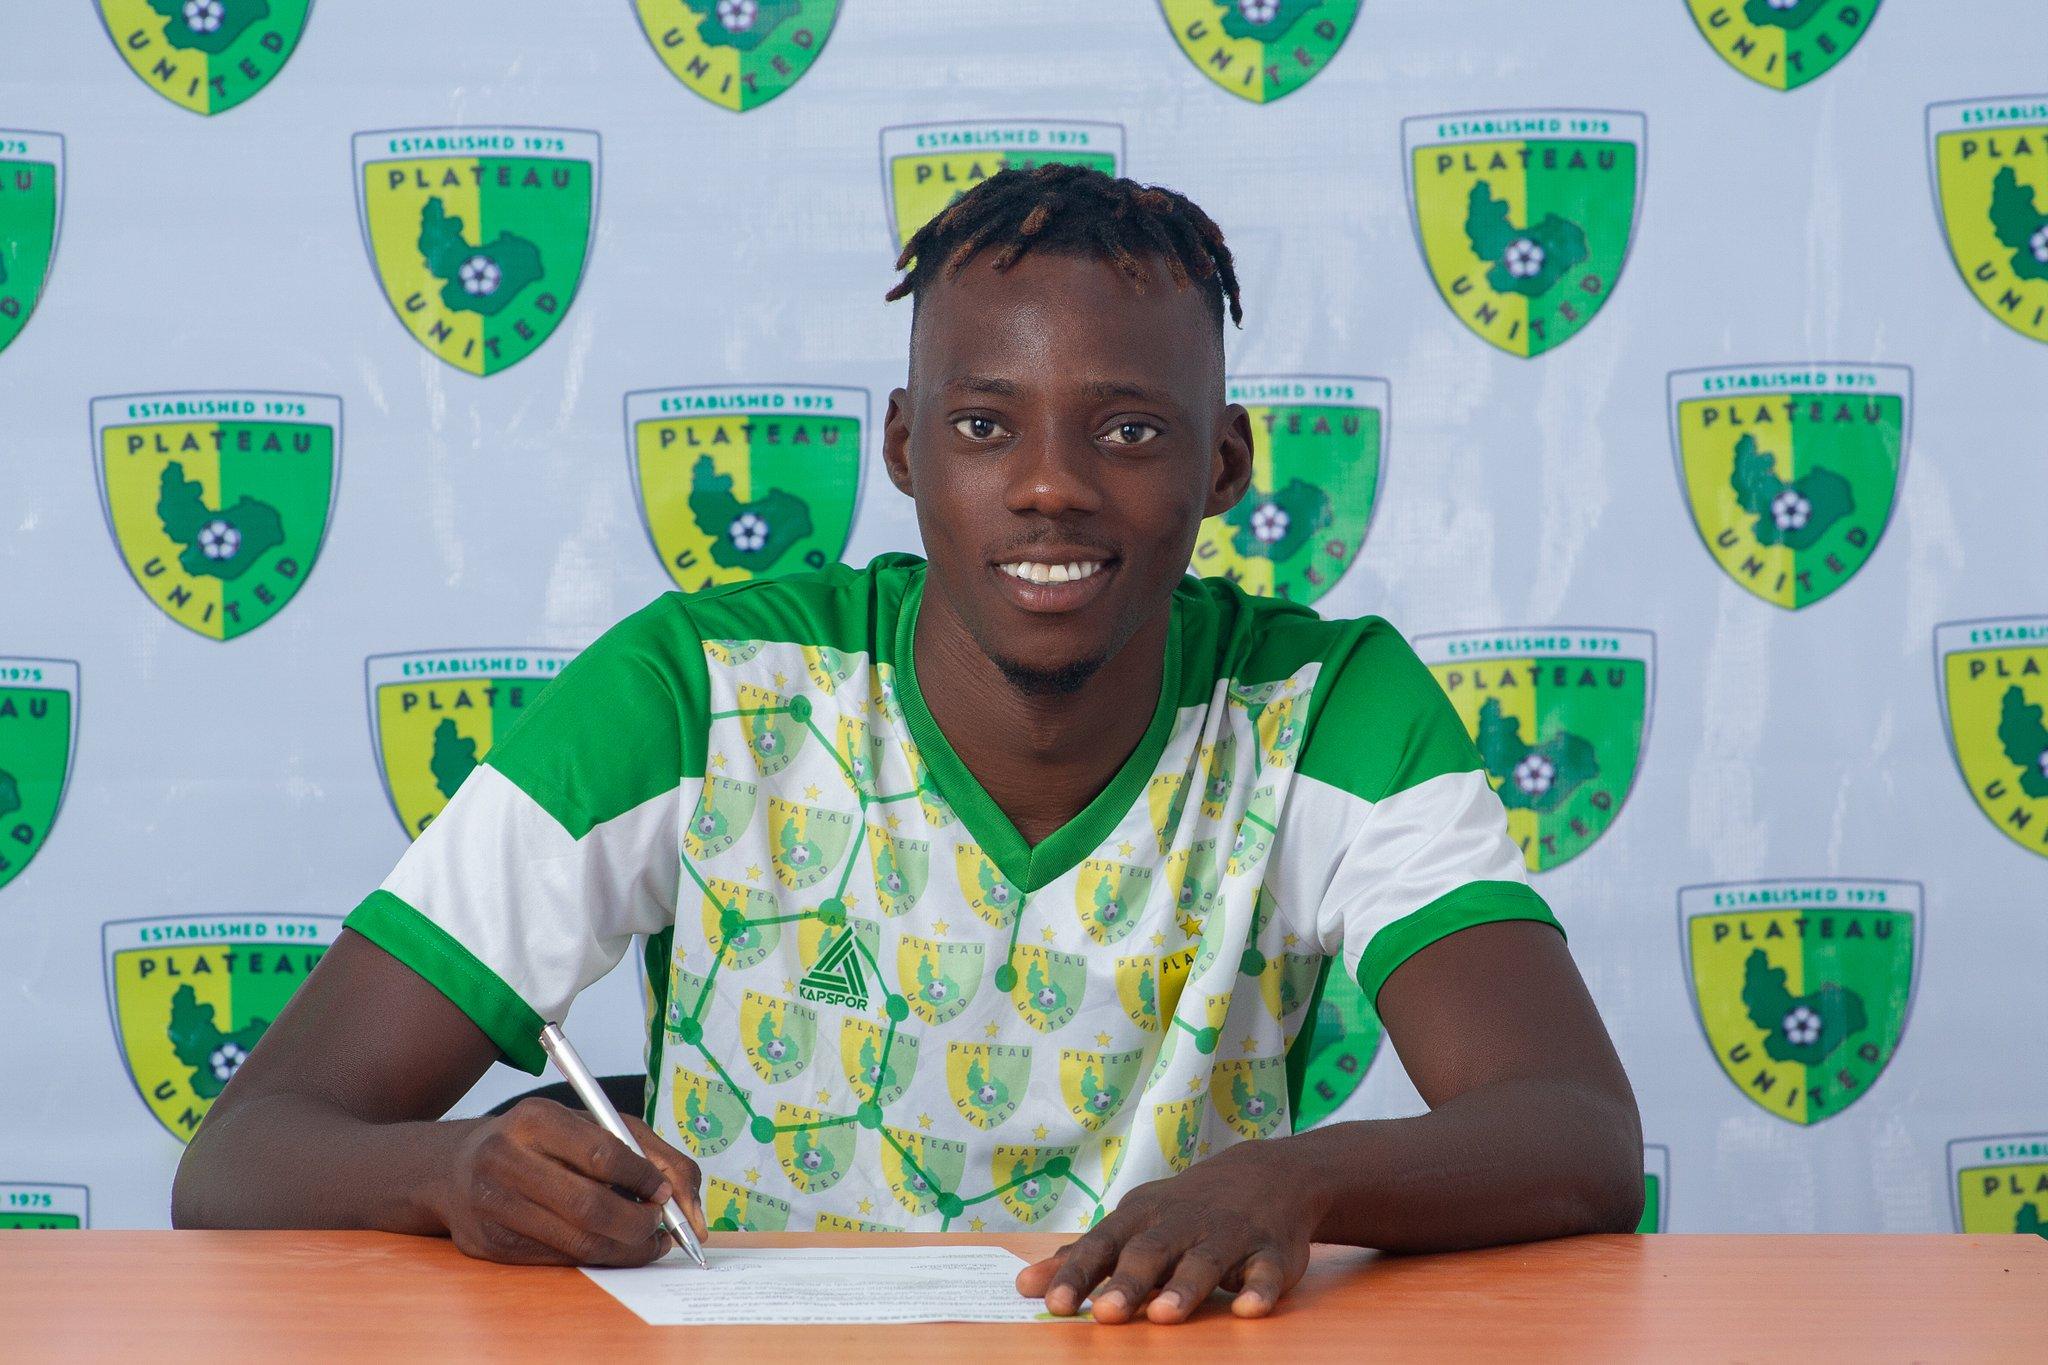 Plateau United completes the signing of Sunday Adetunji